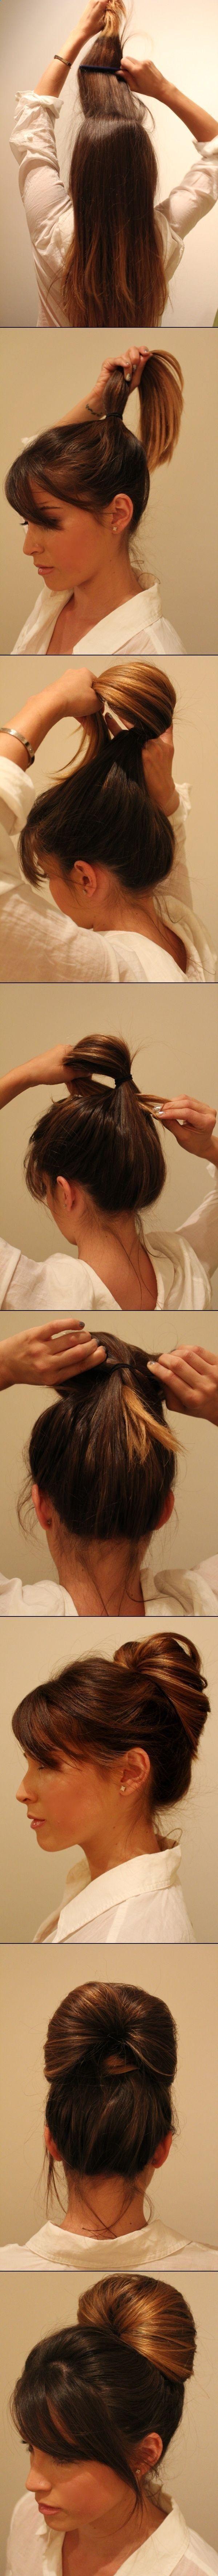 So much cuter than a ponytail.